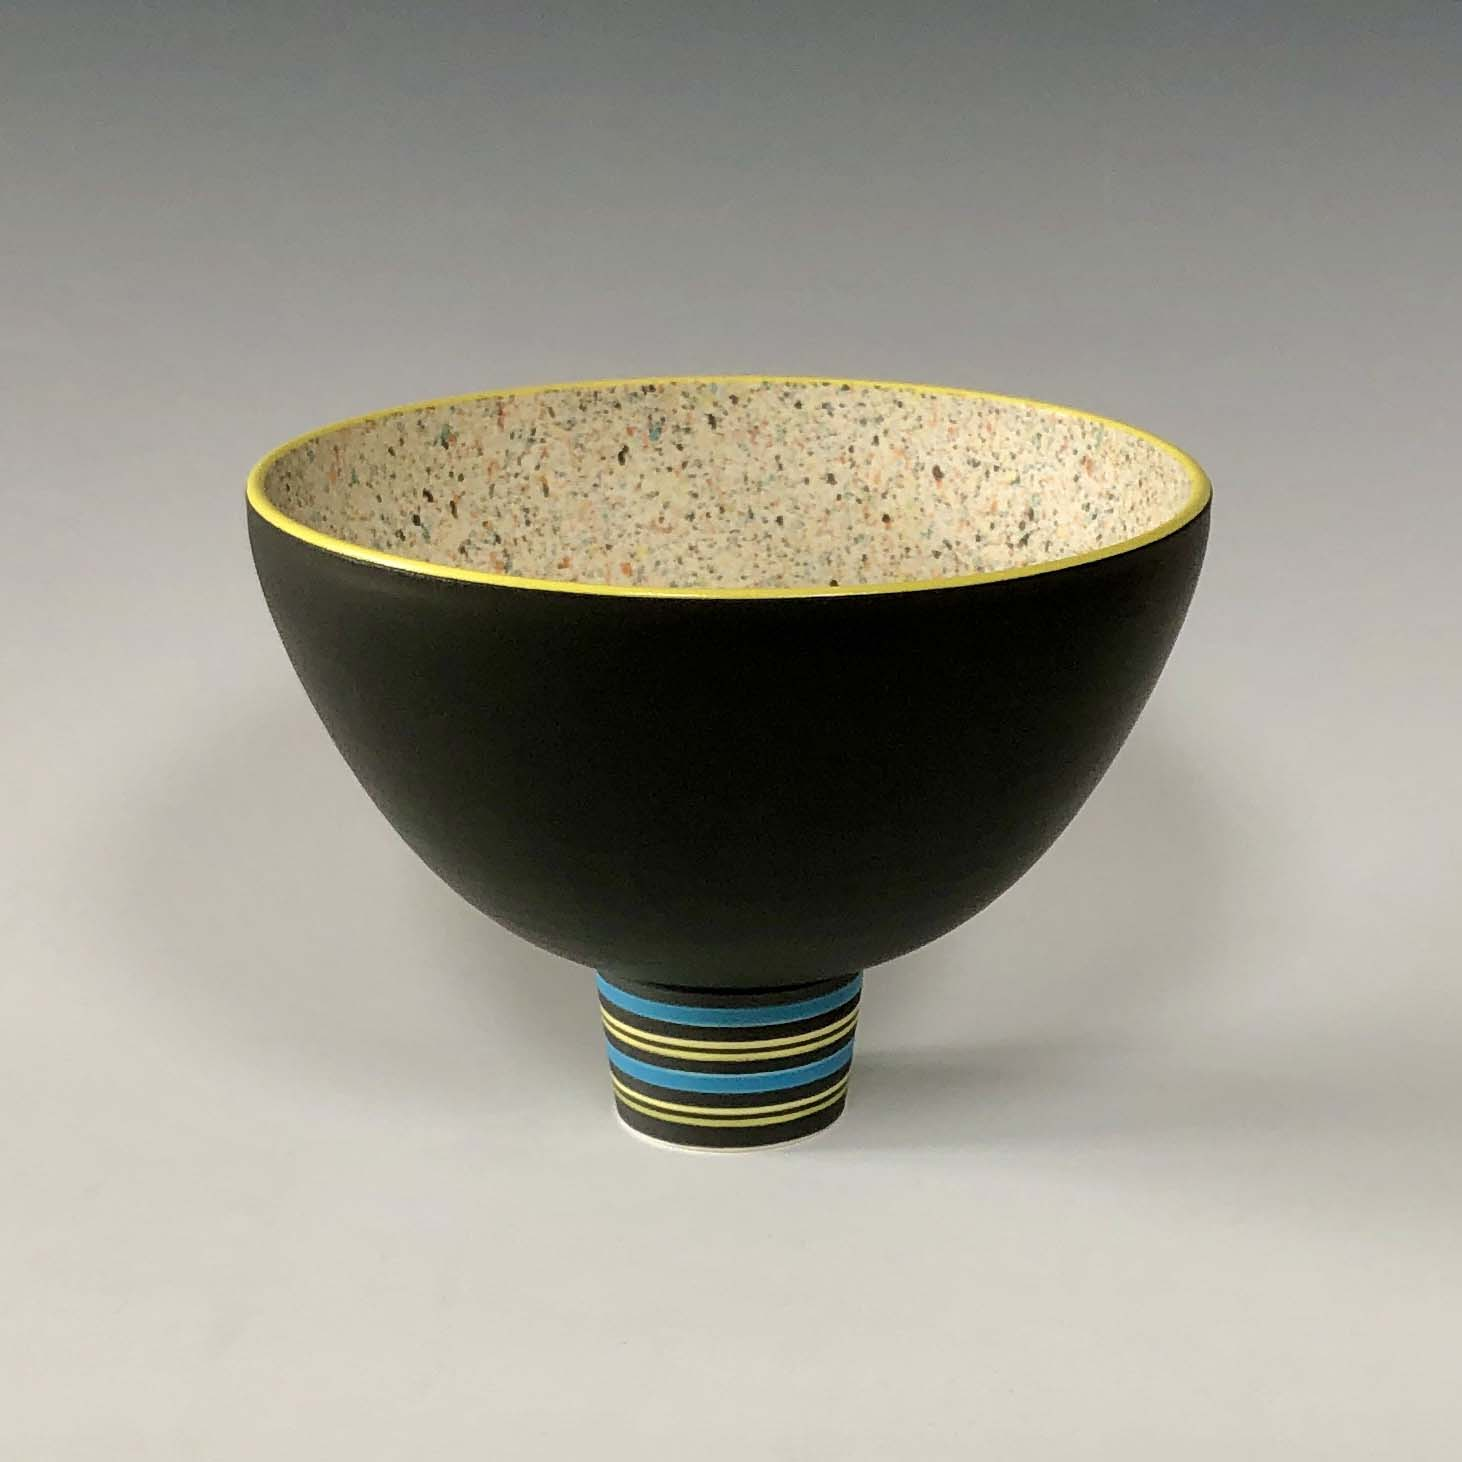 Pot 10. Black:Yellow flecked bowl on striped foot